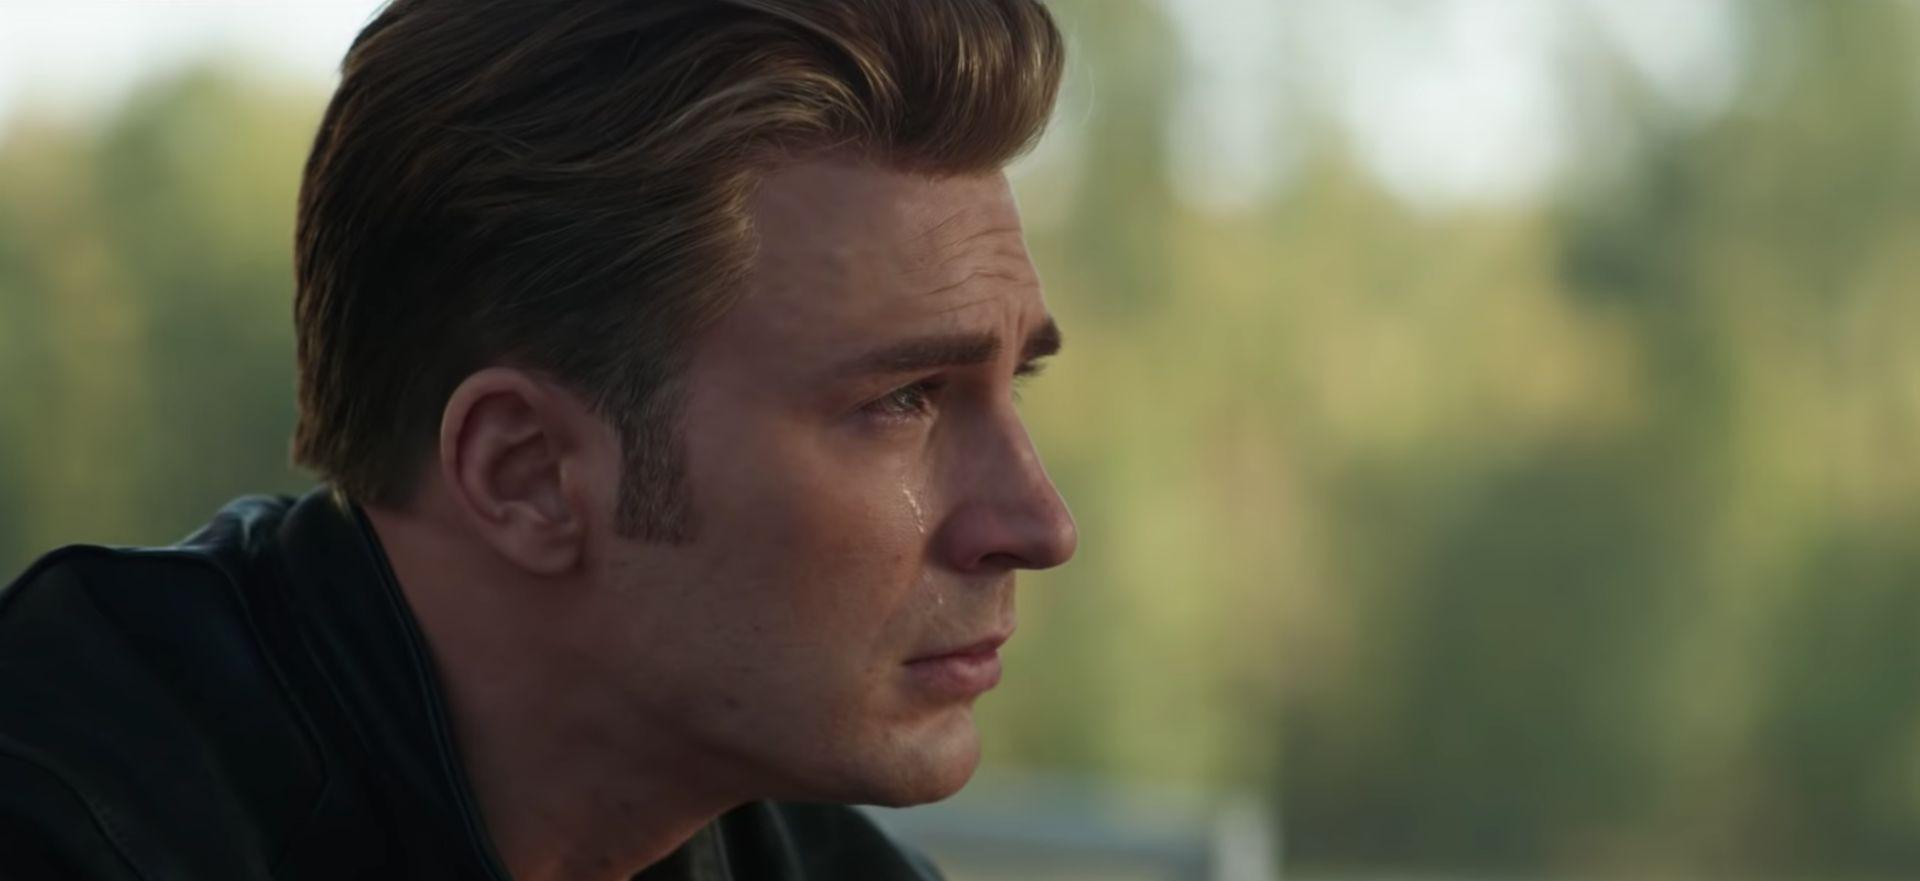 Avengers 4 lại bị lộ thêm số phận của Captain America - Ảnh 3.